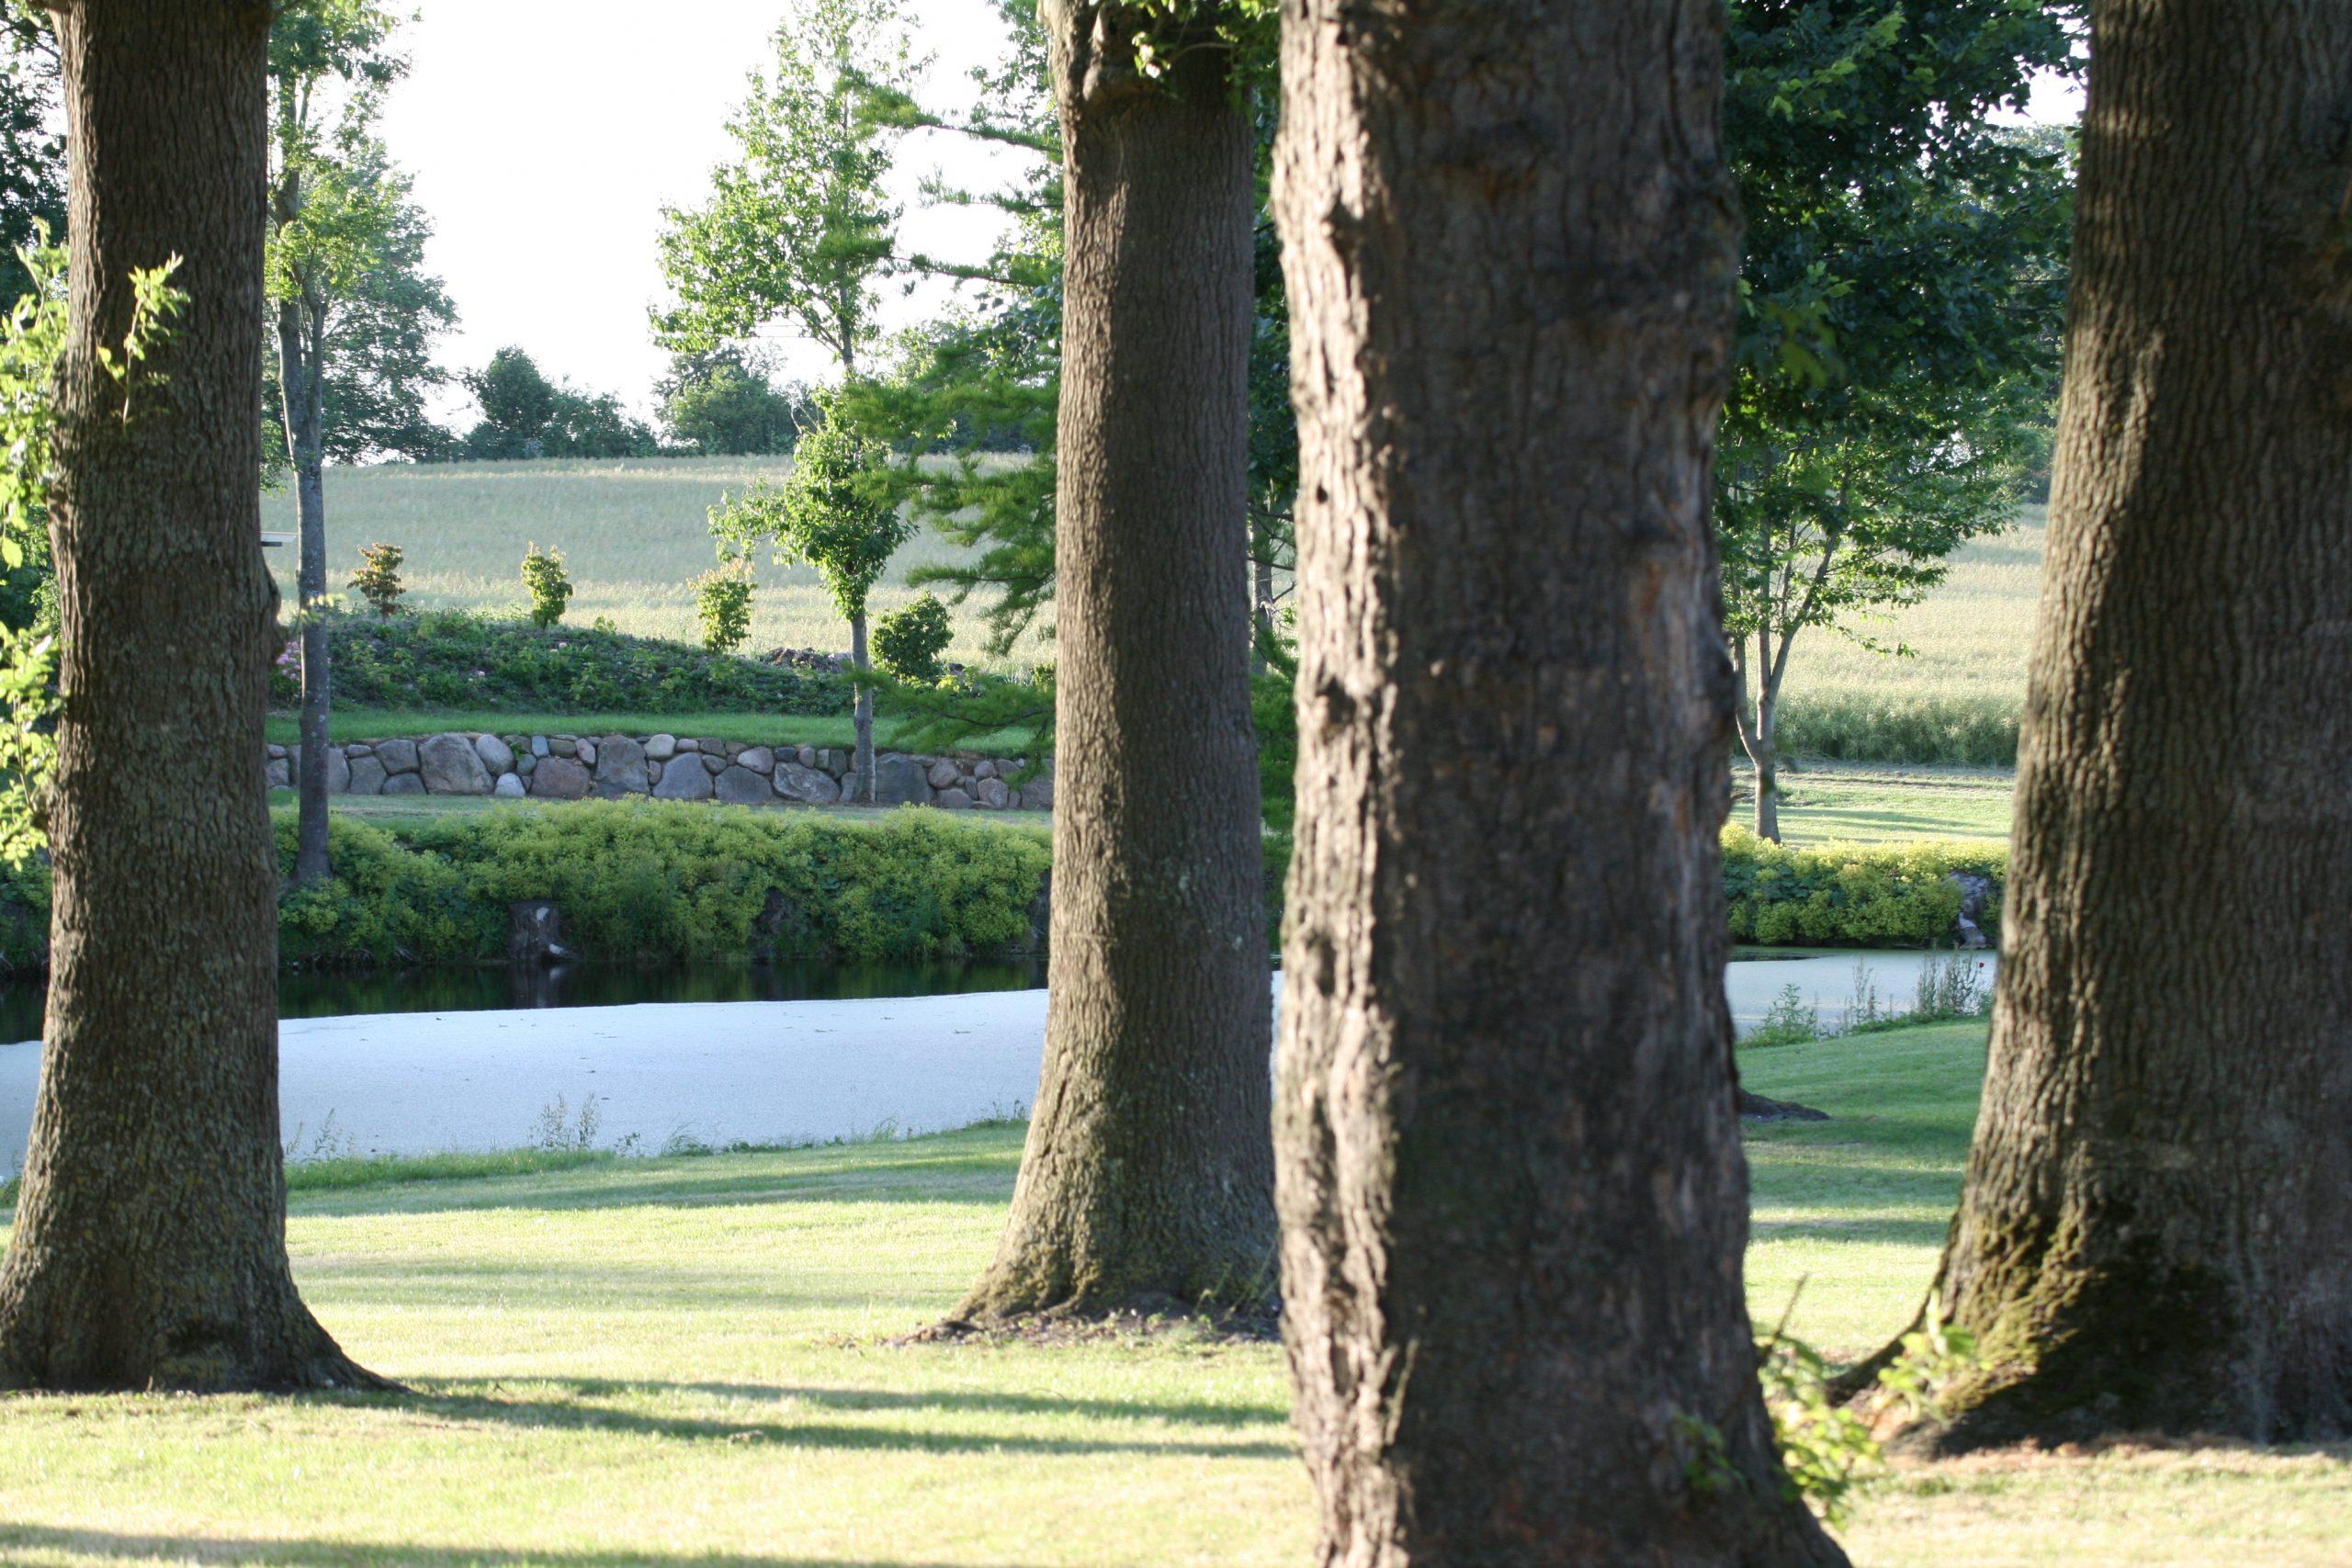 Gut Friederikenhof - weite Grünflächen